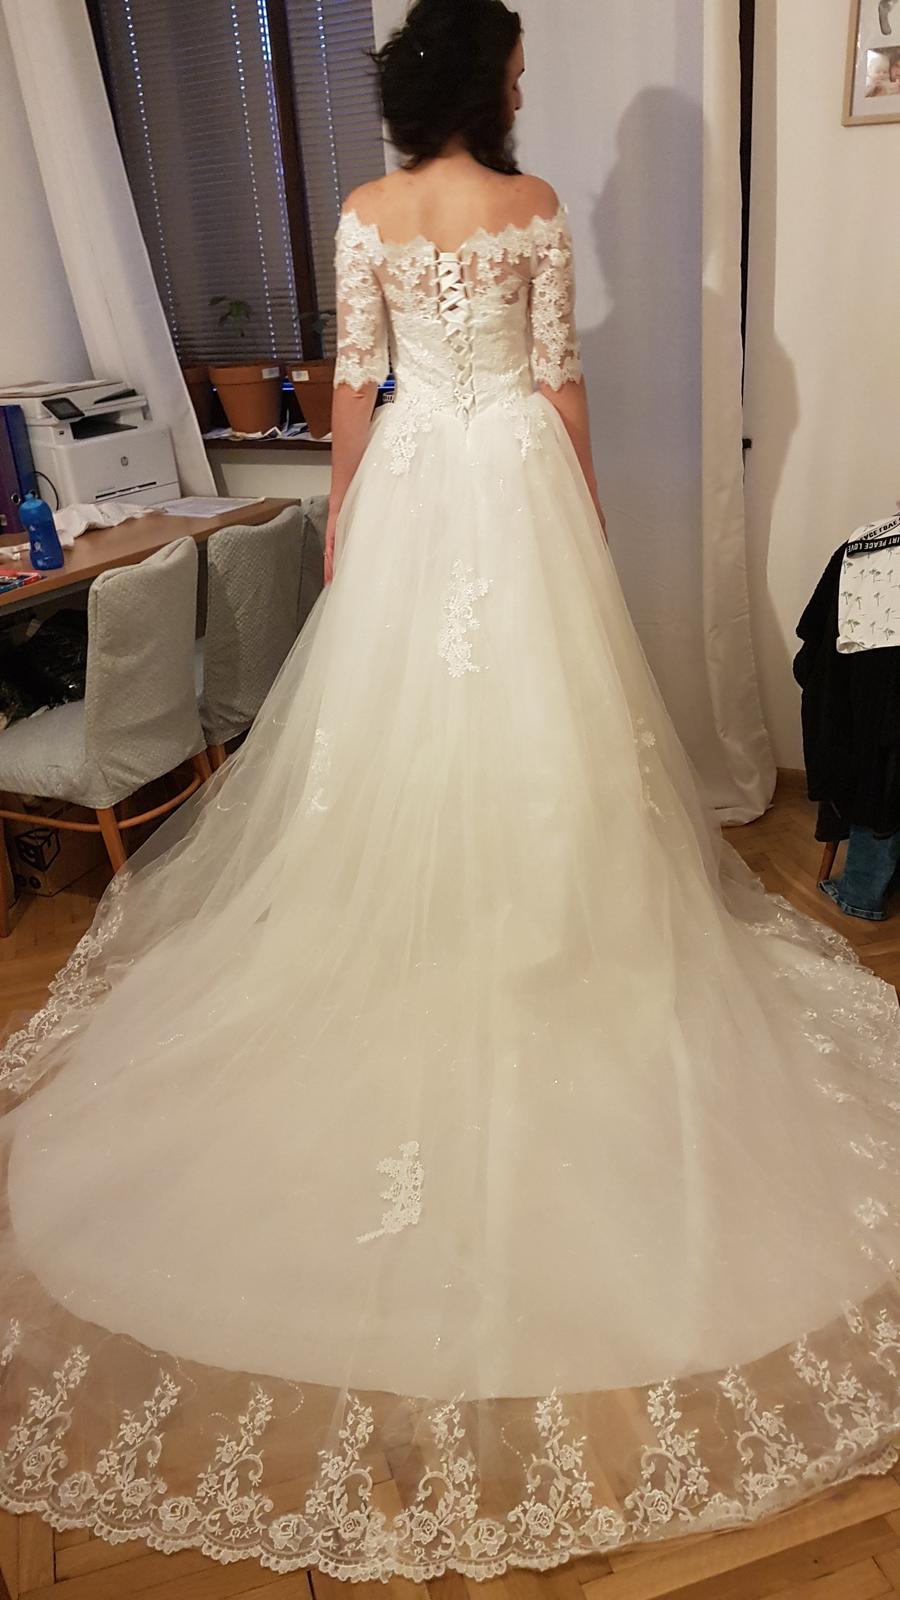 Svadobné šaty S/36 - Obrázok č. 1